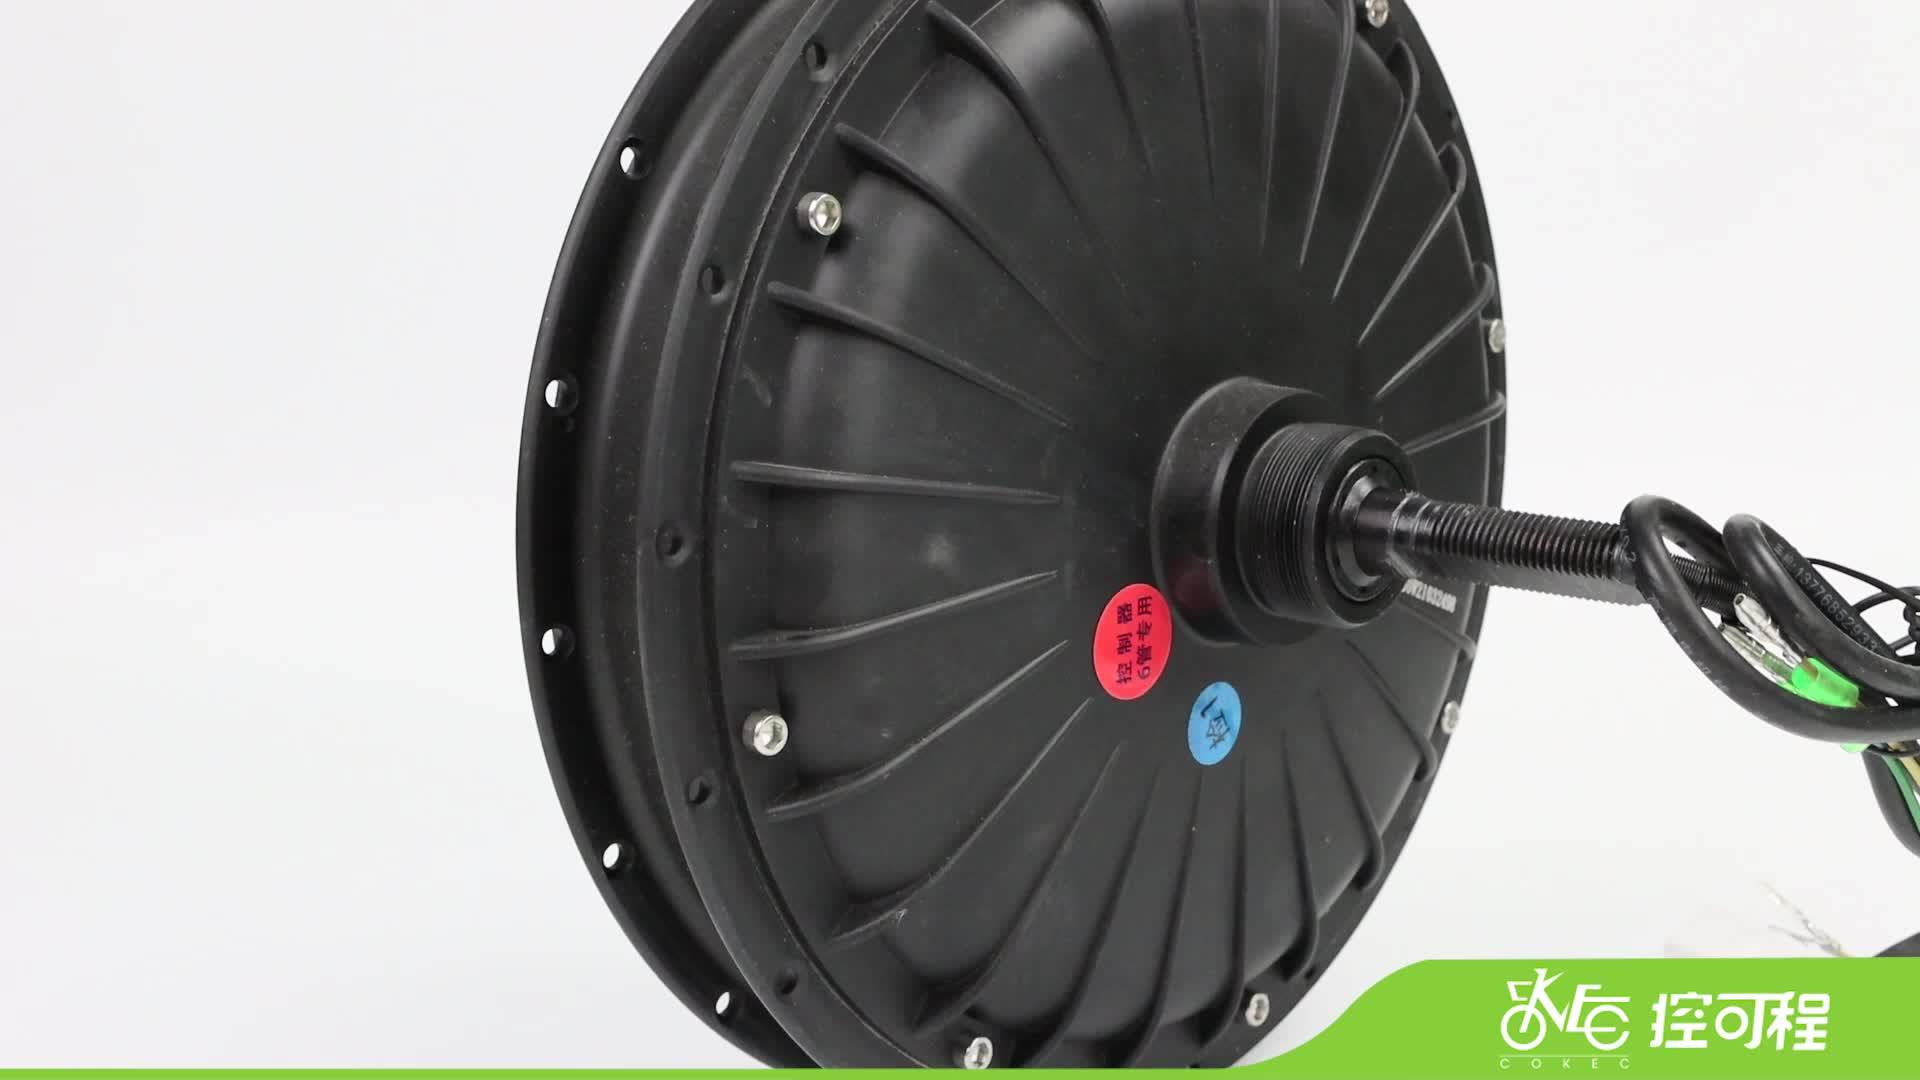 48V Ebike 무브러시 Gearless 모터 바퀴 전기 자전거 장비 350W